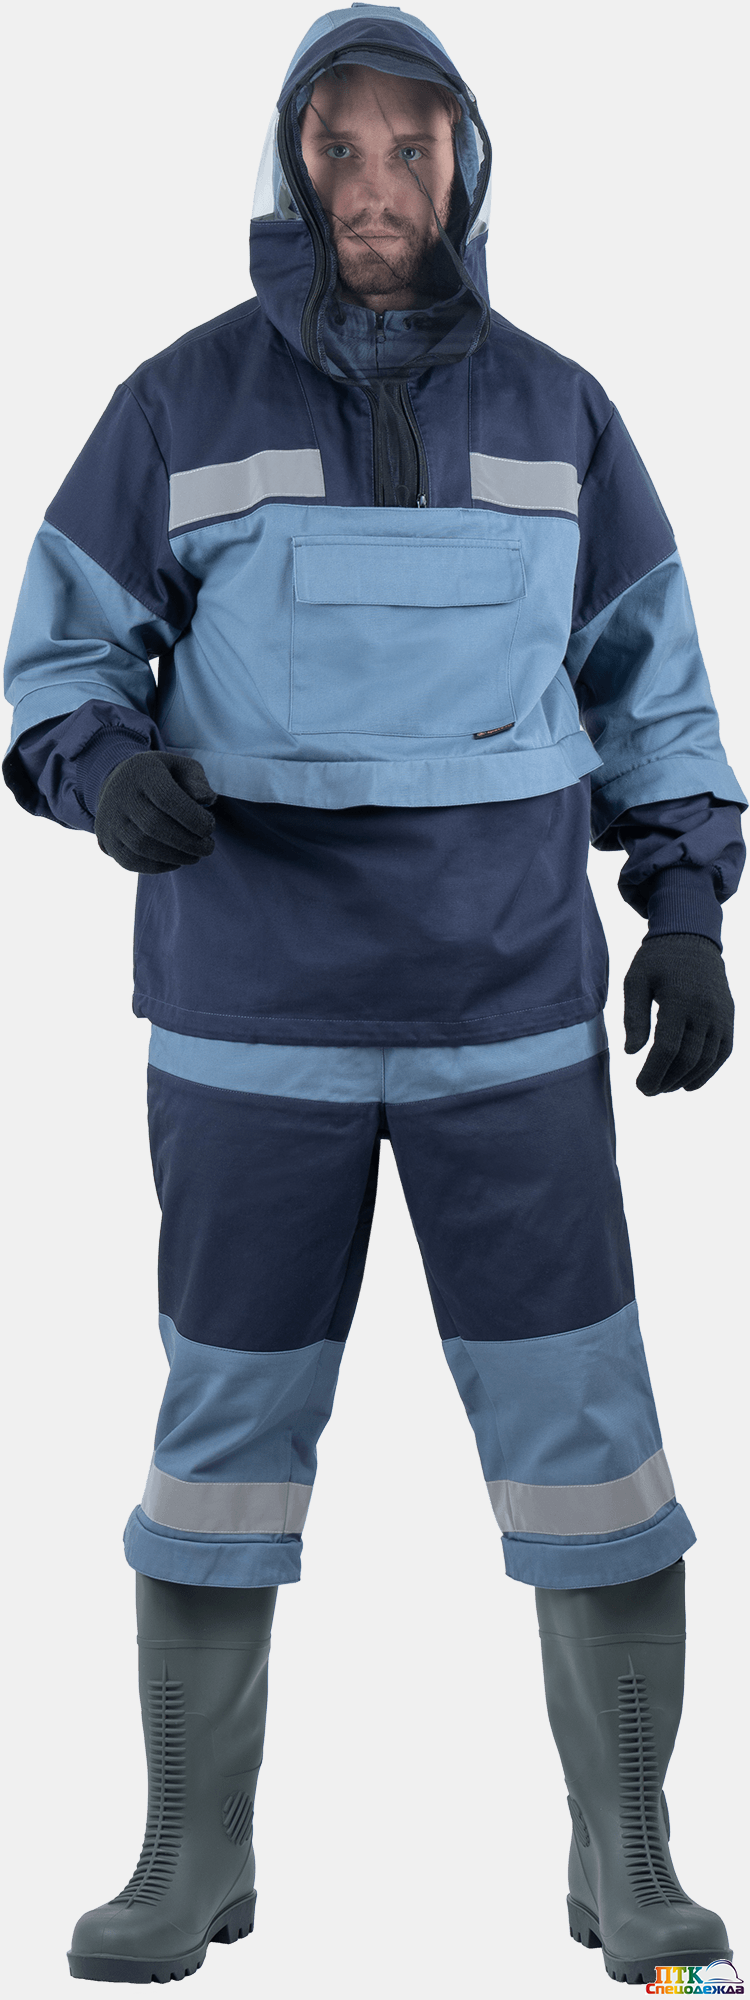 Костюм противоэнцефалитный БИОСЕЙФ ПРОТЕКТ, серый-синий